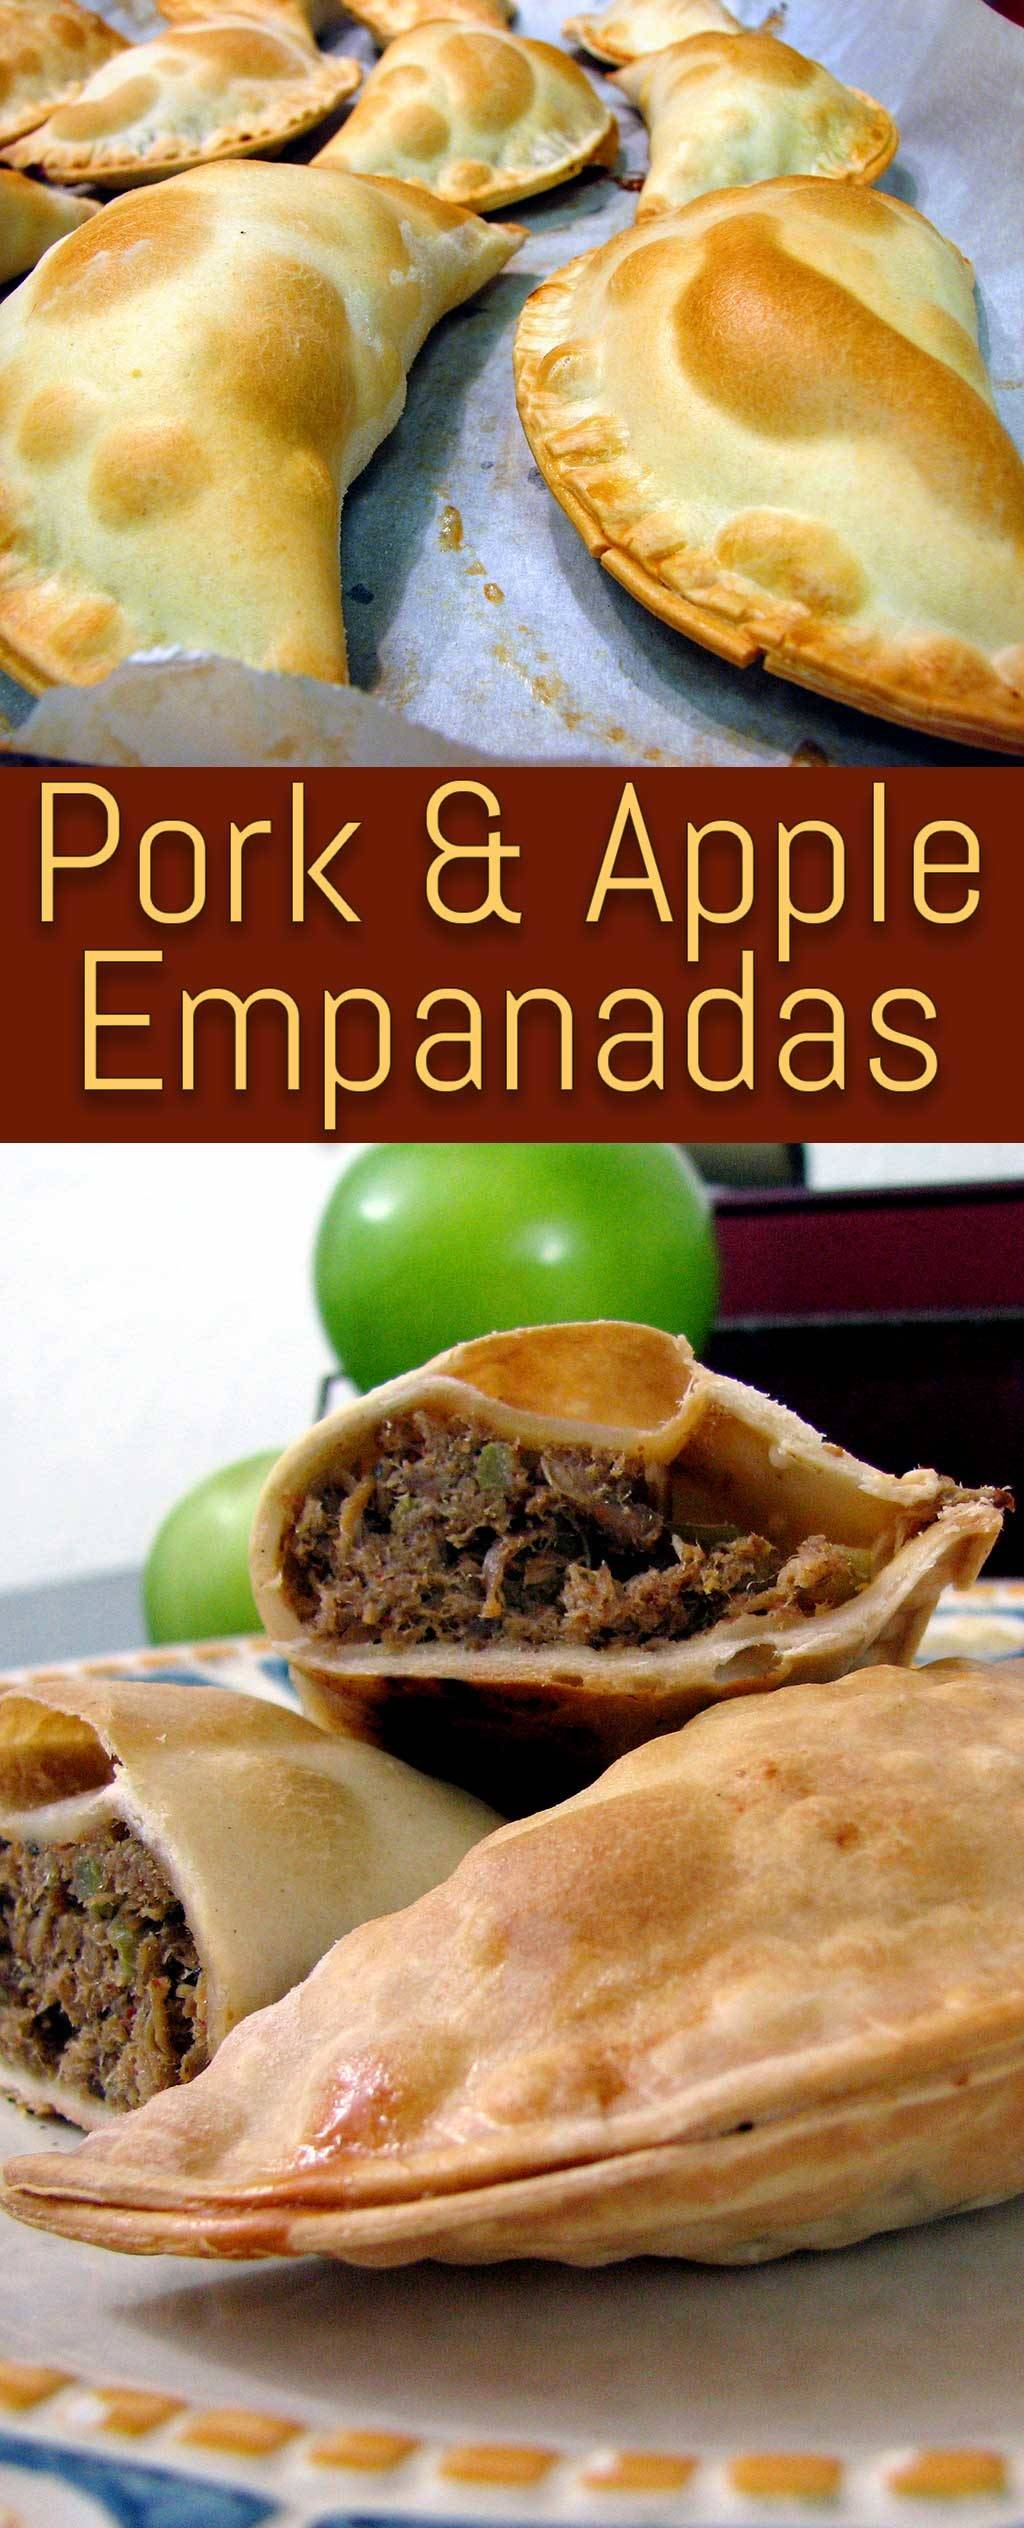 Pork & Apple Empanadas